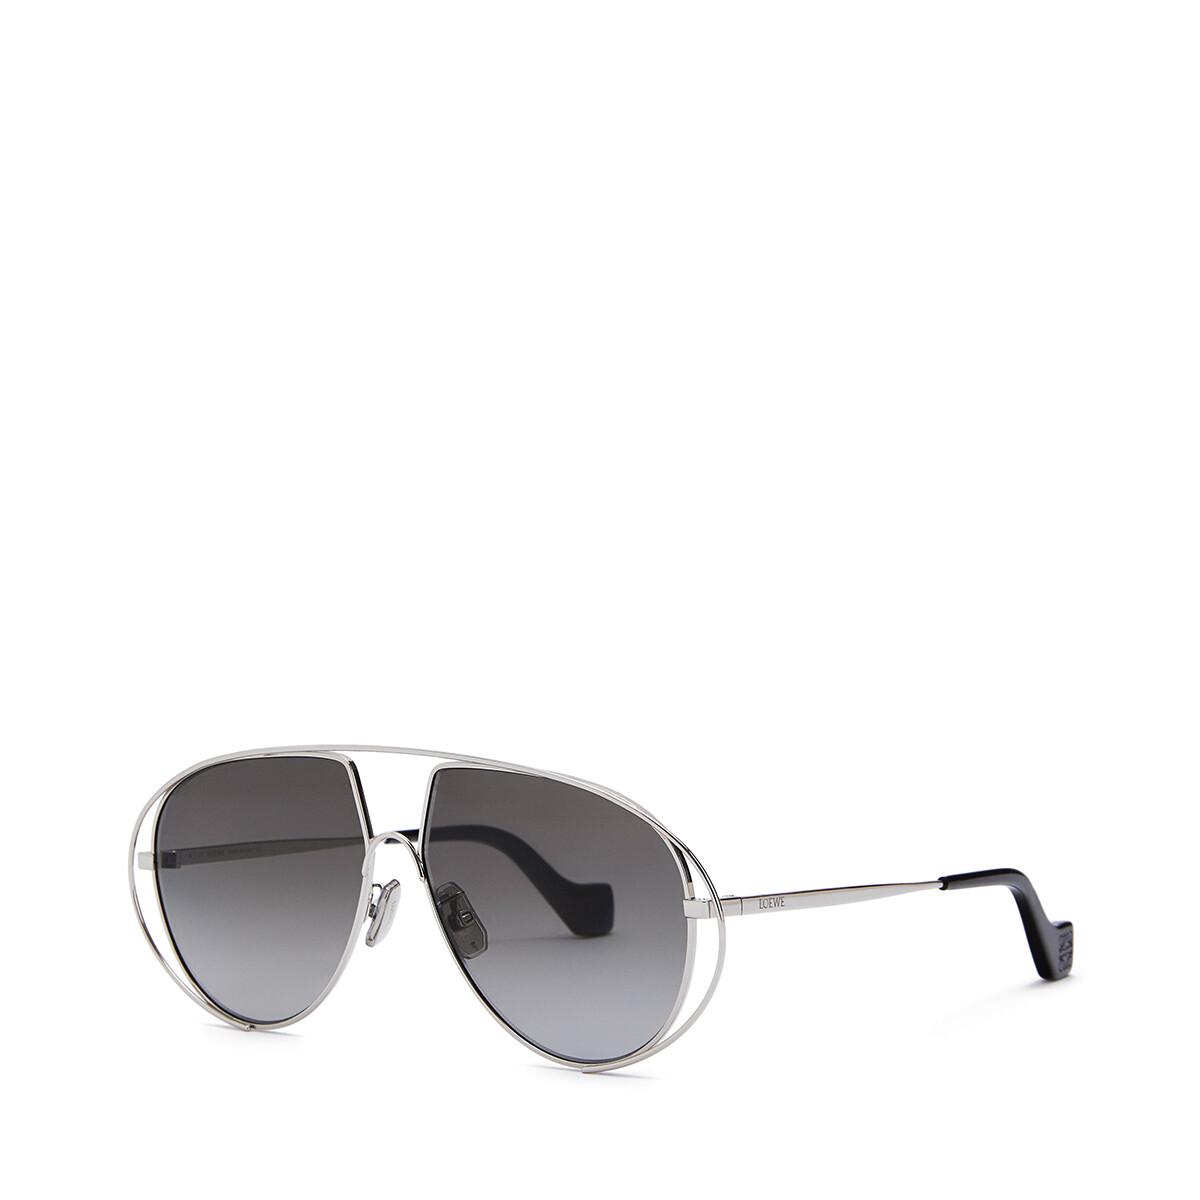 LOEWE Metal Pilot Sunglasses Anthracite front